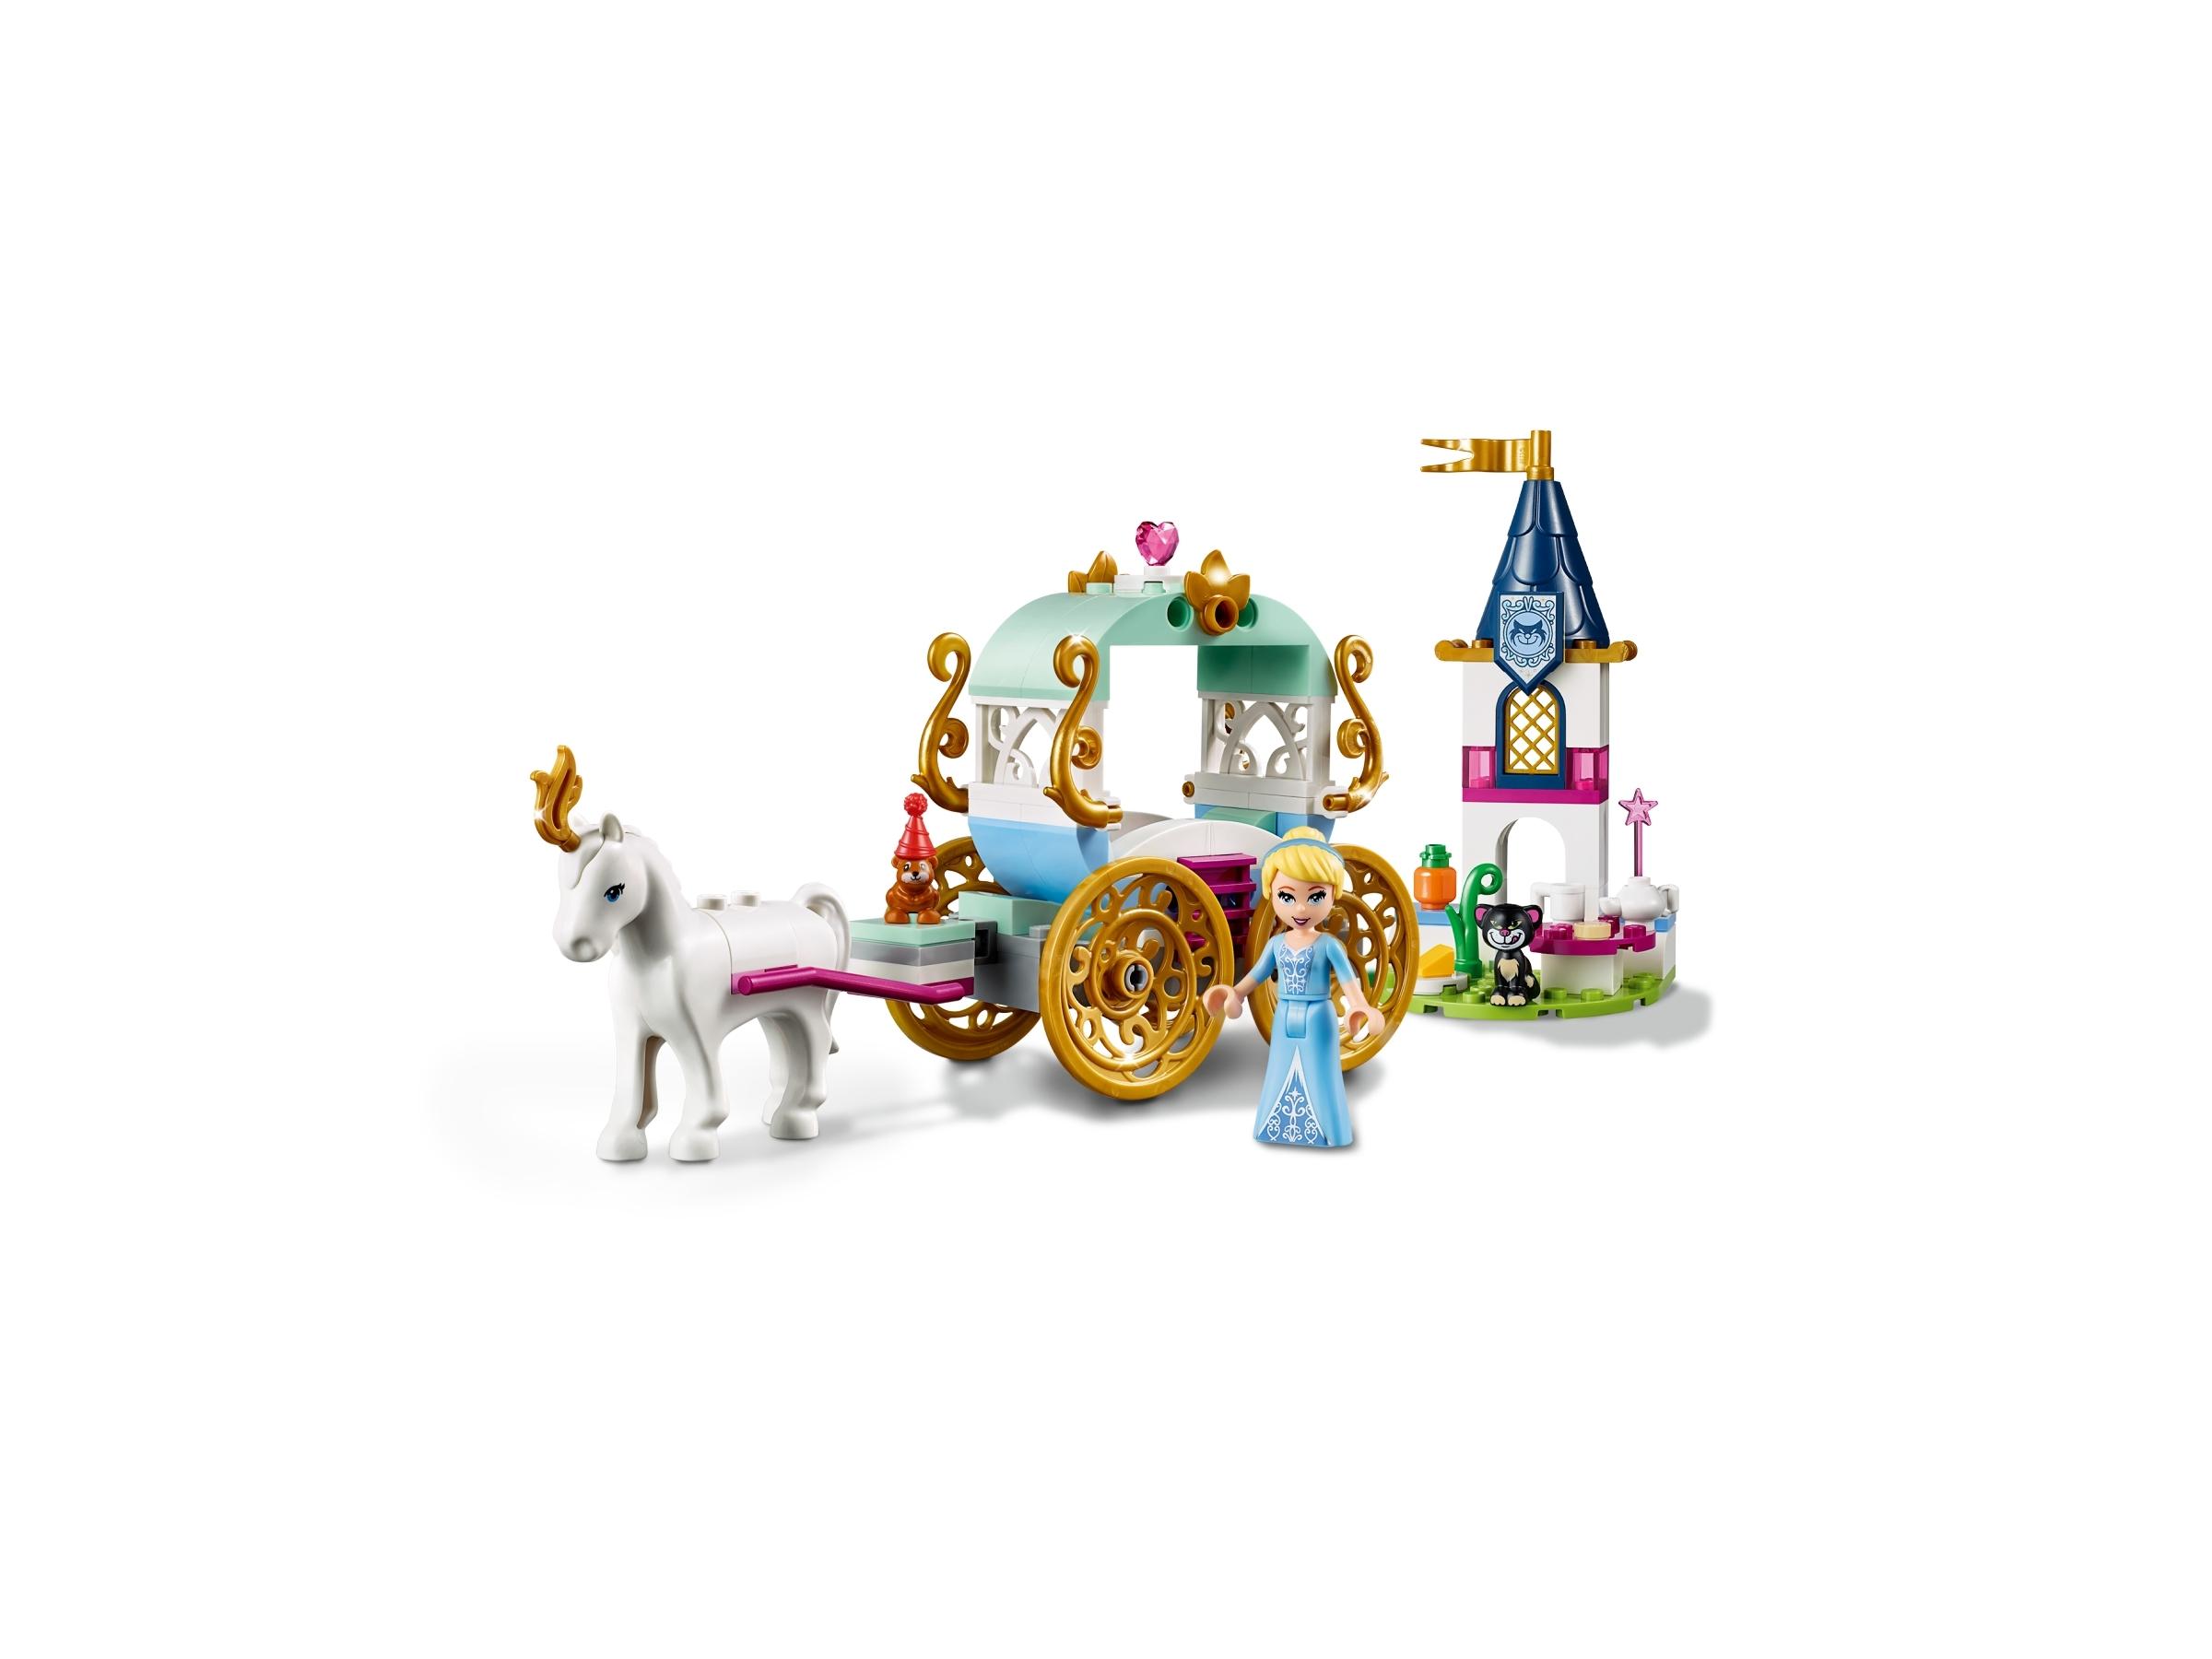 LEGO 41159 Disney Princess Cinderella's Horse And Carriage Ride Building Kit Set